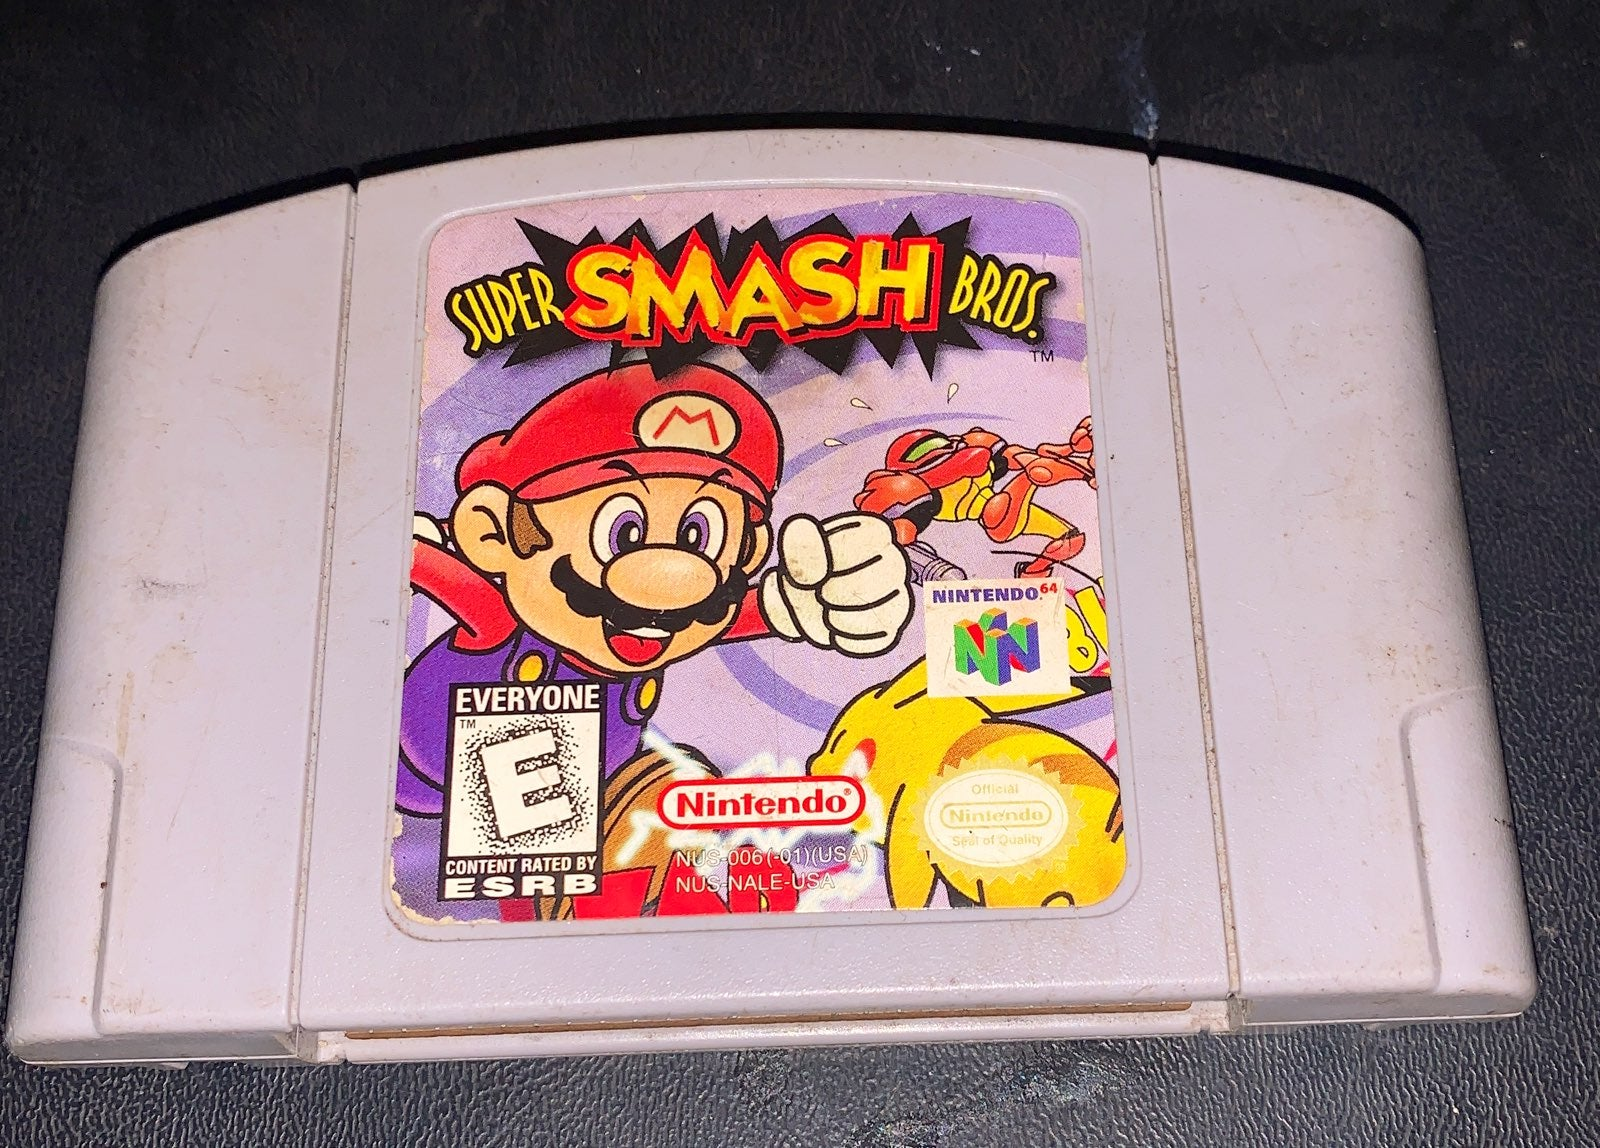 Super Smash Bros. Video game